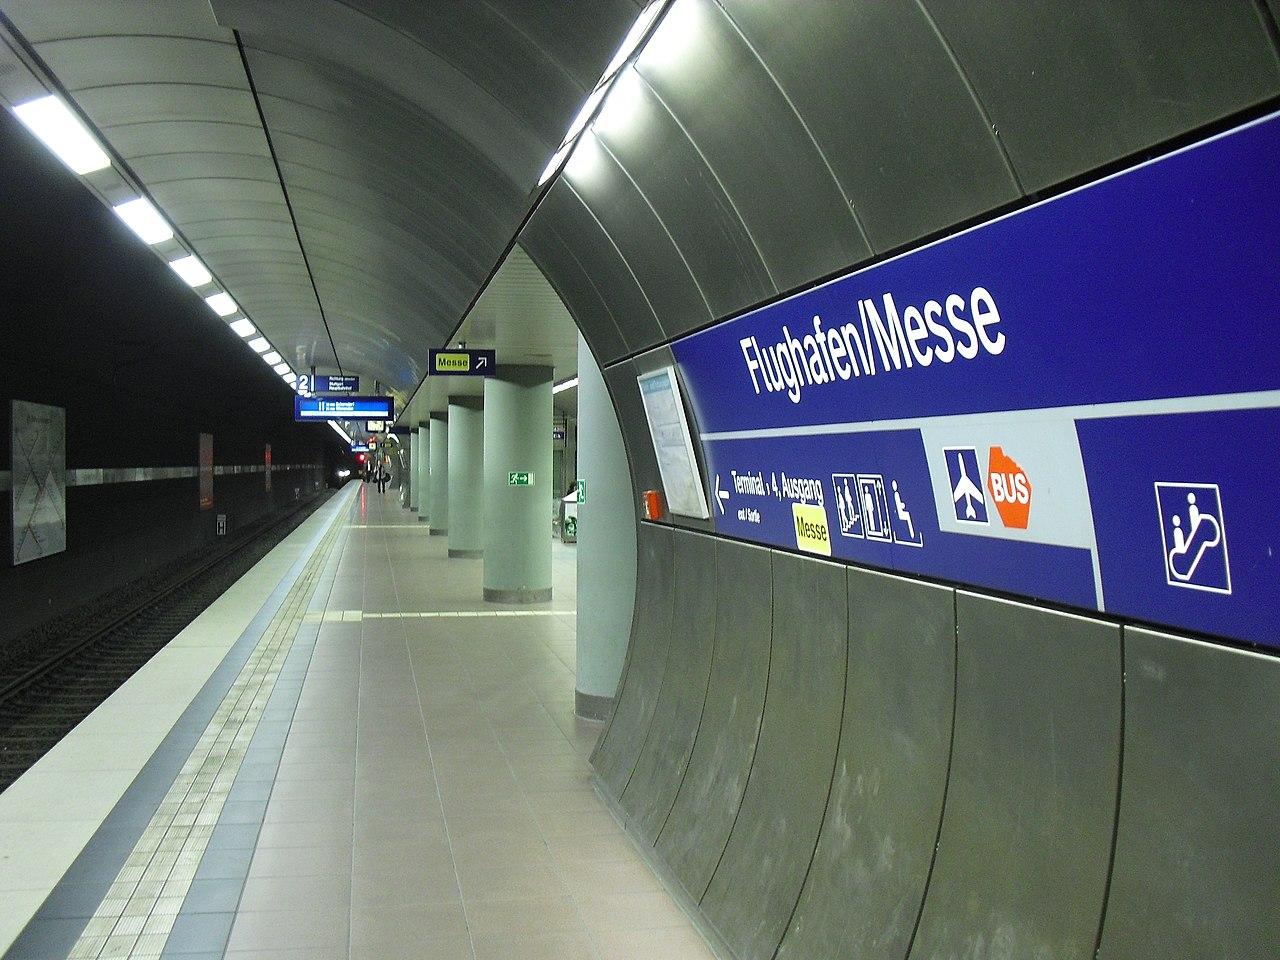 Bahnhof Stuttgart Flughafen/Messe